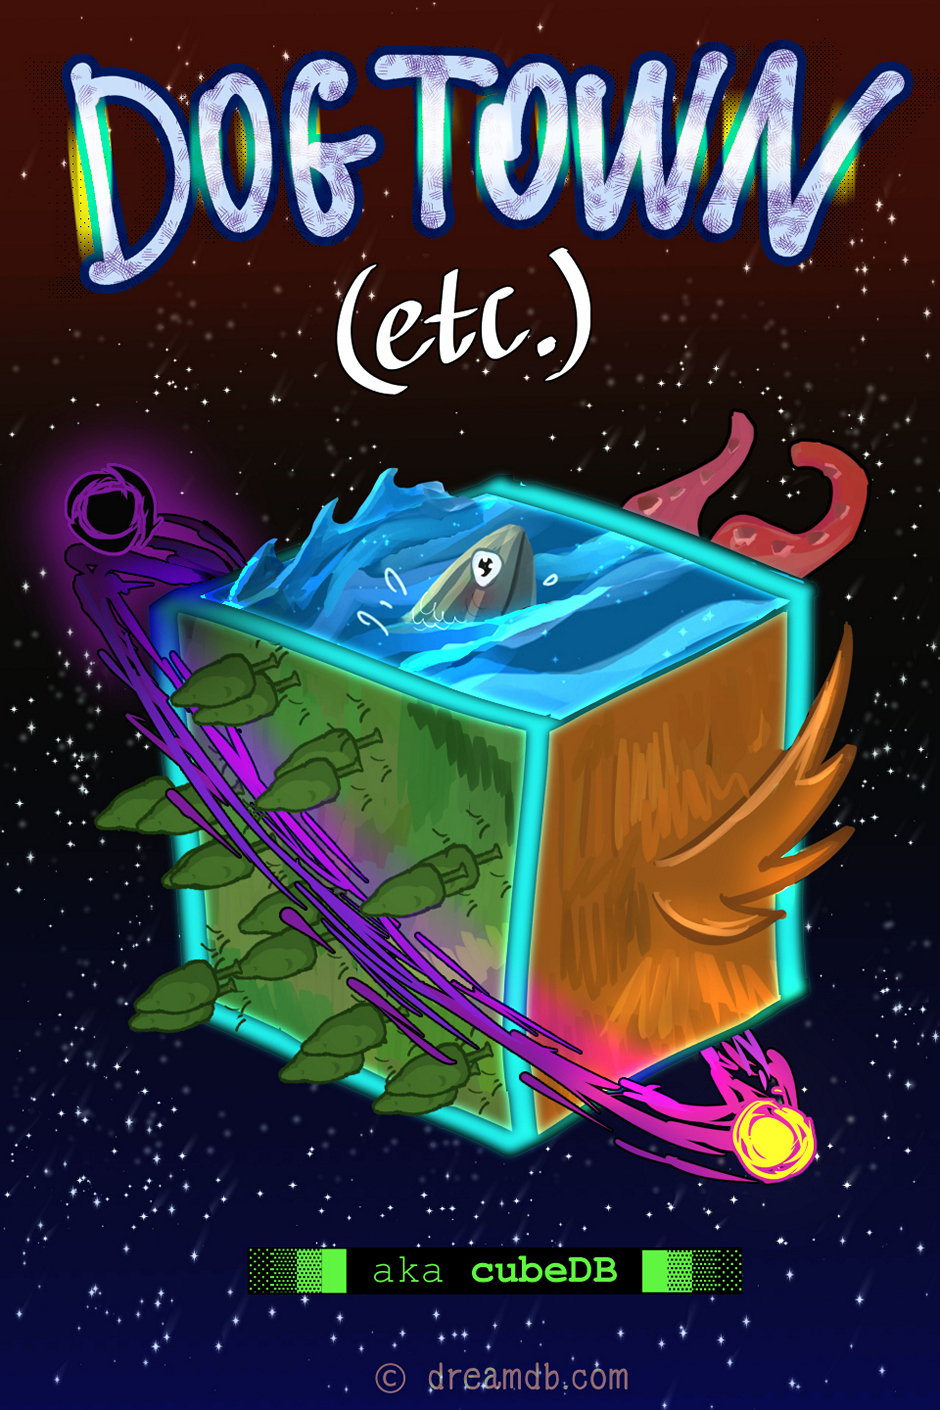 Dogtown, etc aka CubeDB